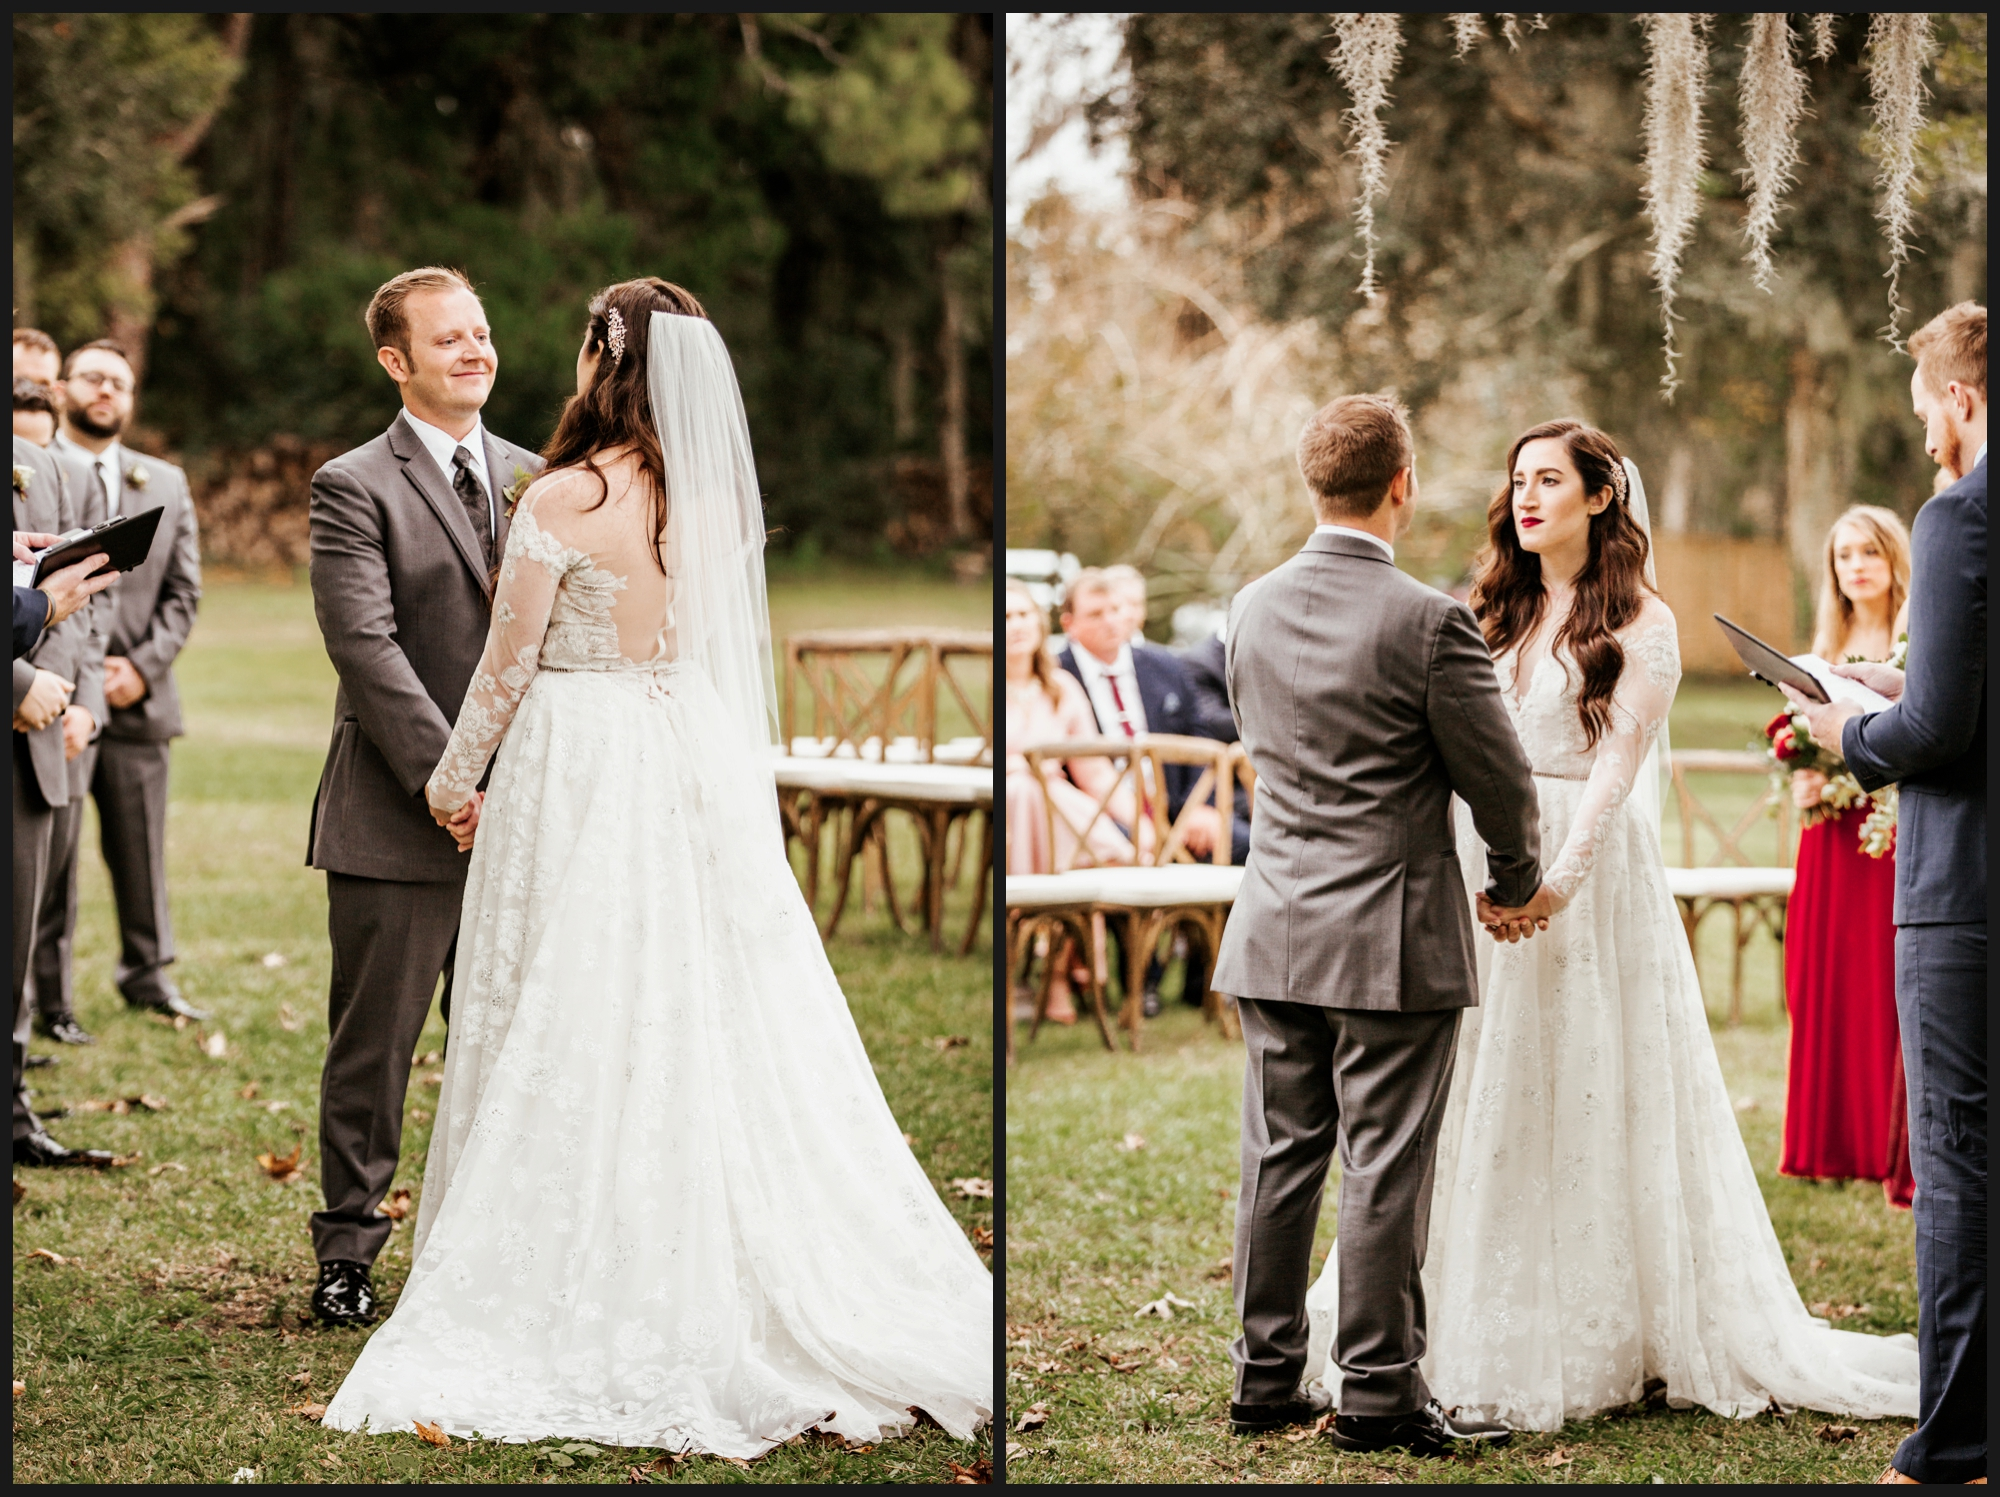 Orlando-Wedding-Photographer-destination-wedding-photographer-florida-wedding-photographer-hawaii-wedding-photographer_0479.jpg